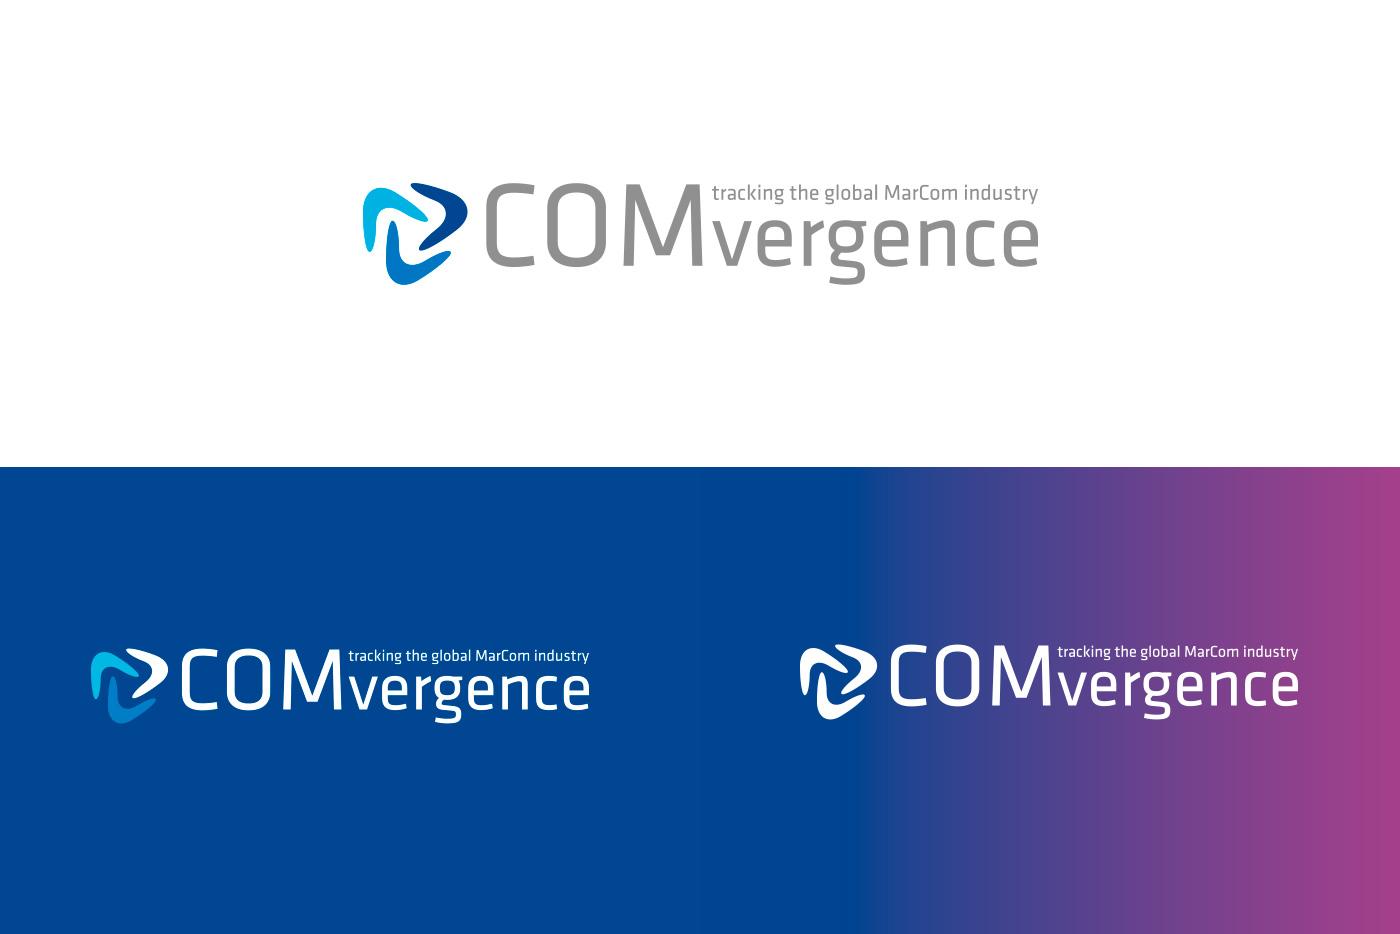 COMvergence logo